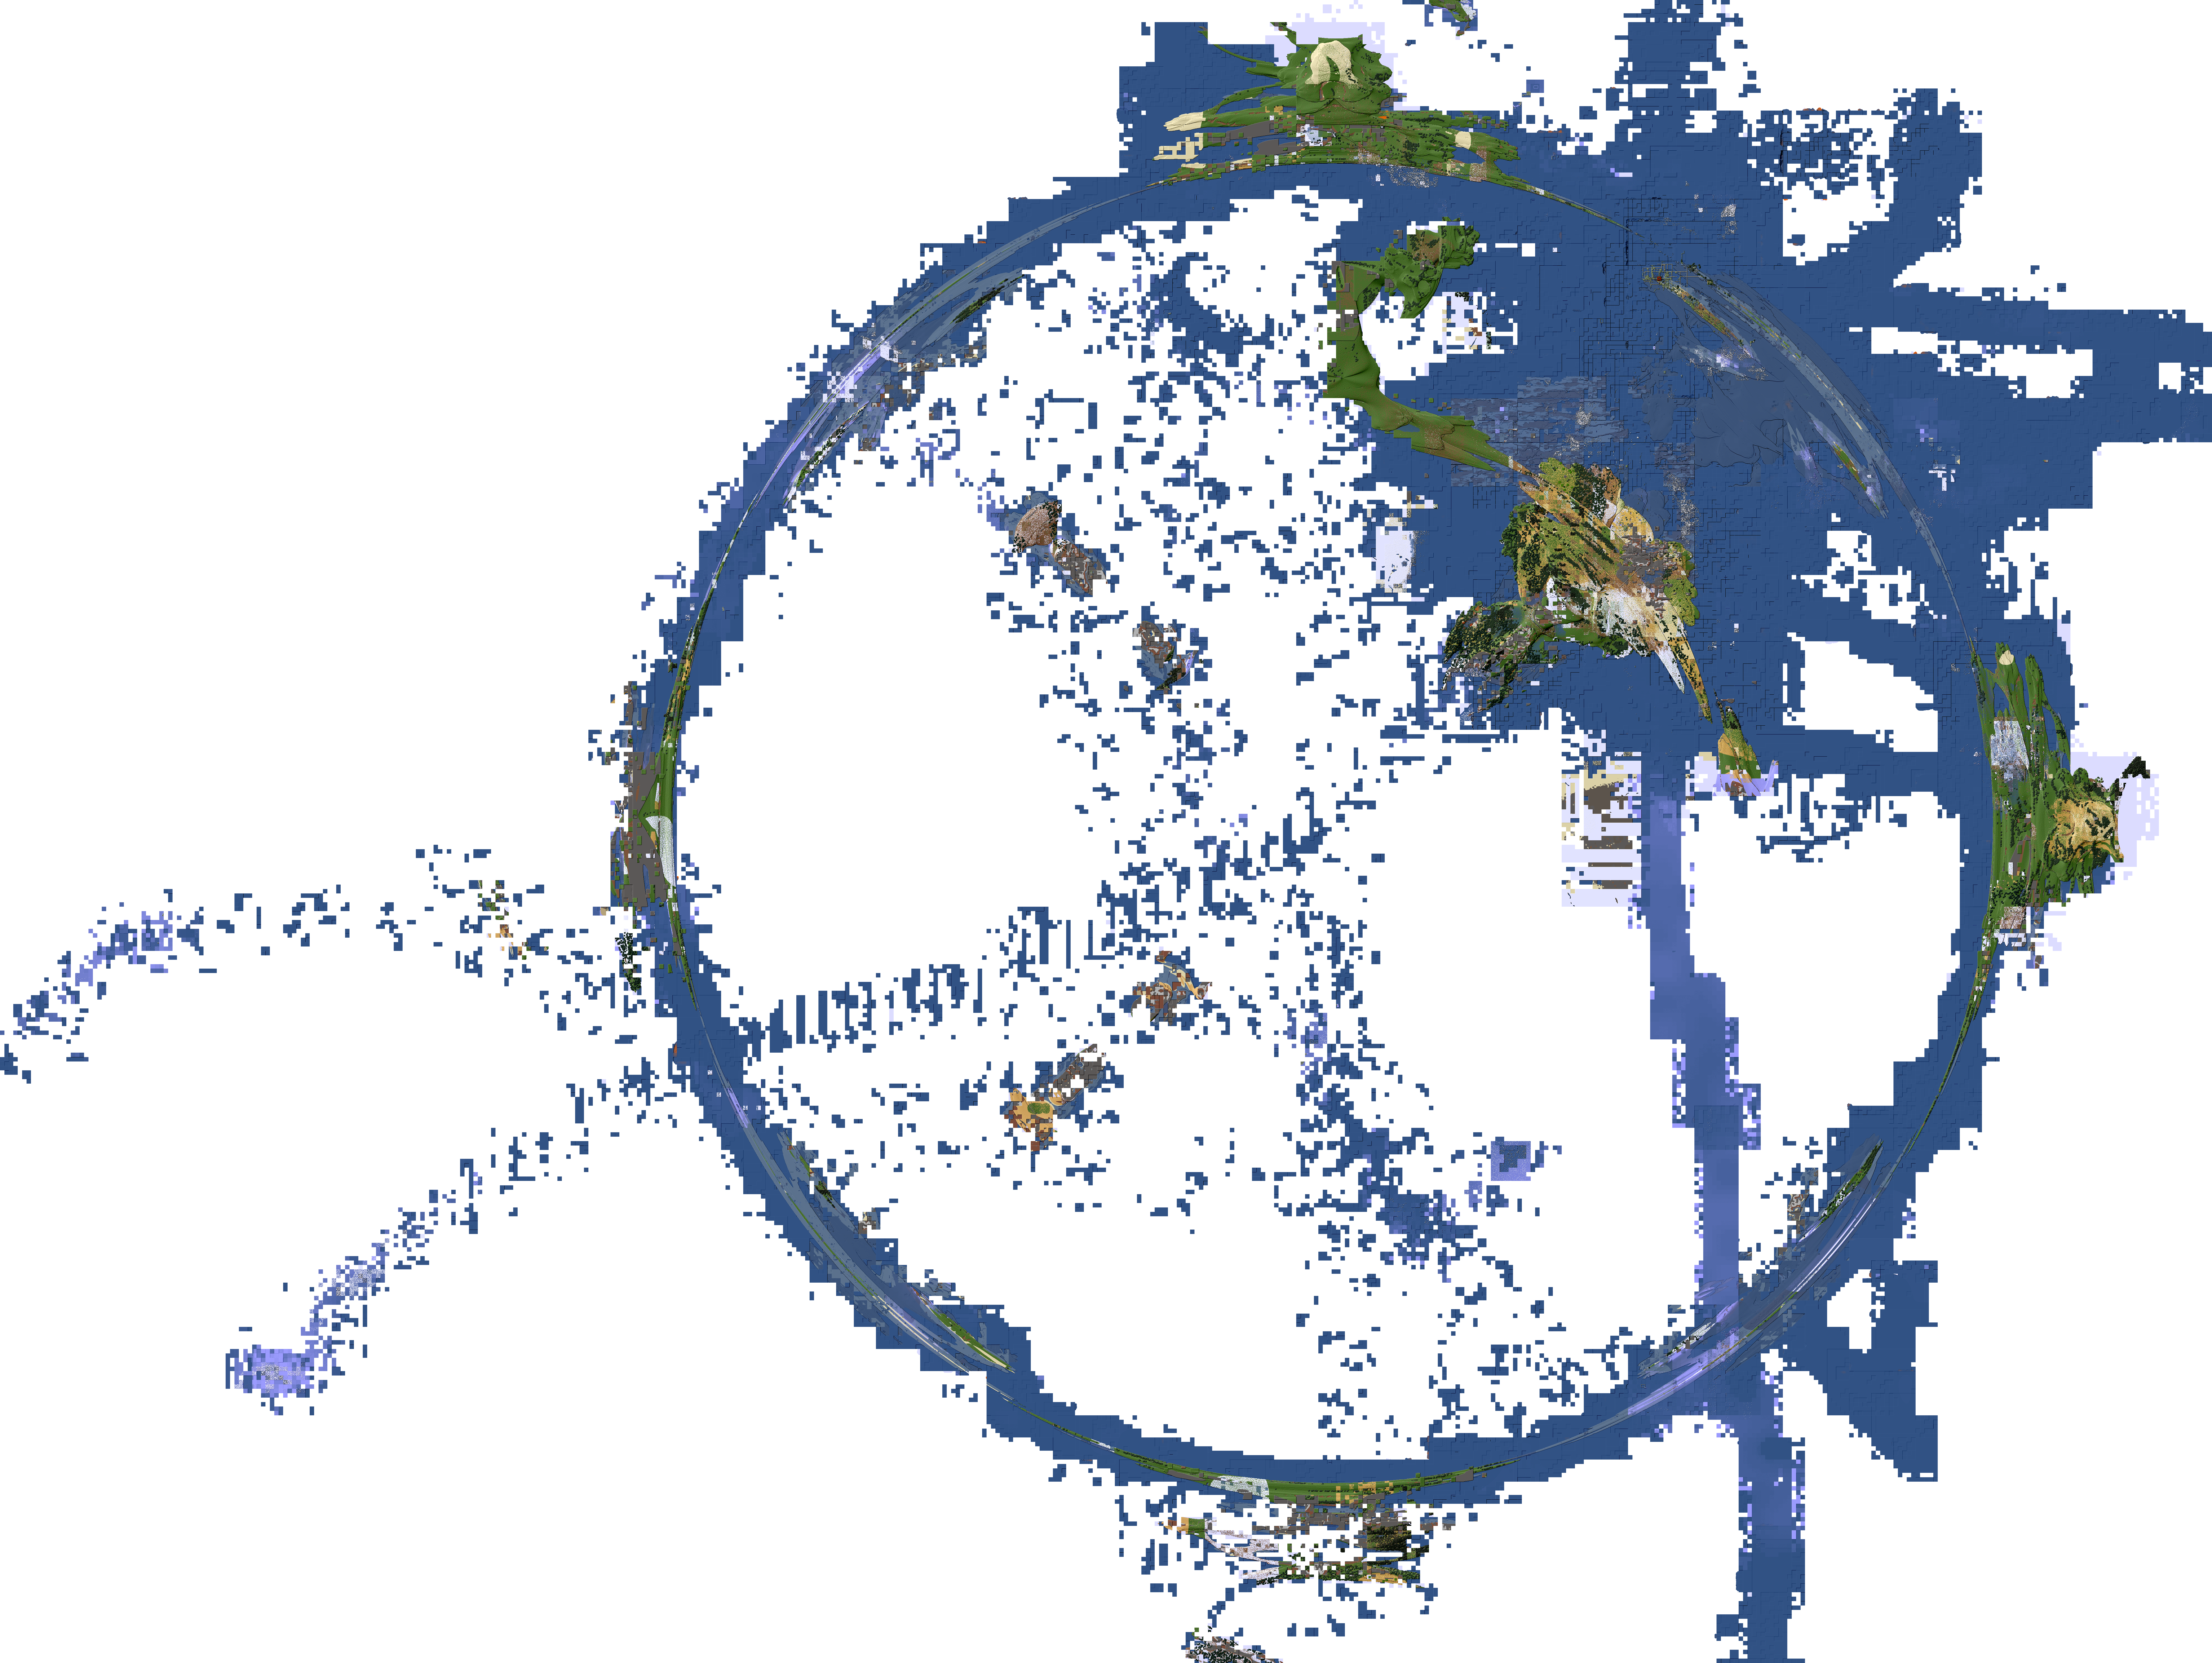 Index of /map.circles/ on painting of circle, world map circle, drawing of circle, diagram of circle, derivative of circle, information circle, table of circle, area of circle, model of circle, design of circle, art of circle, parts of circle, union of circle, book of circle, features of circle, intersection of circle,